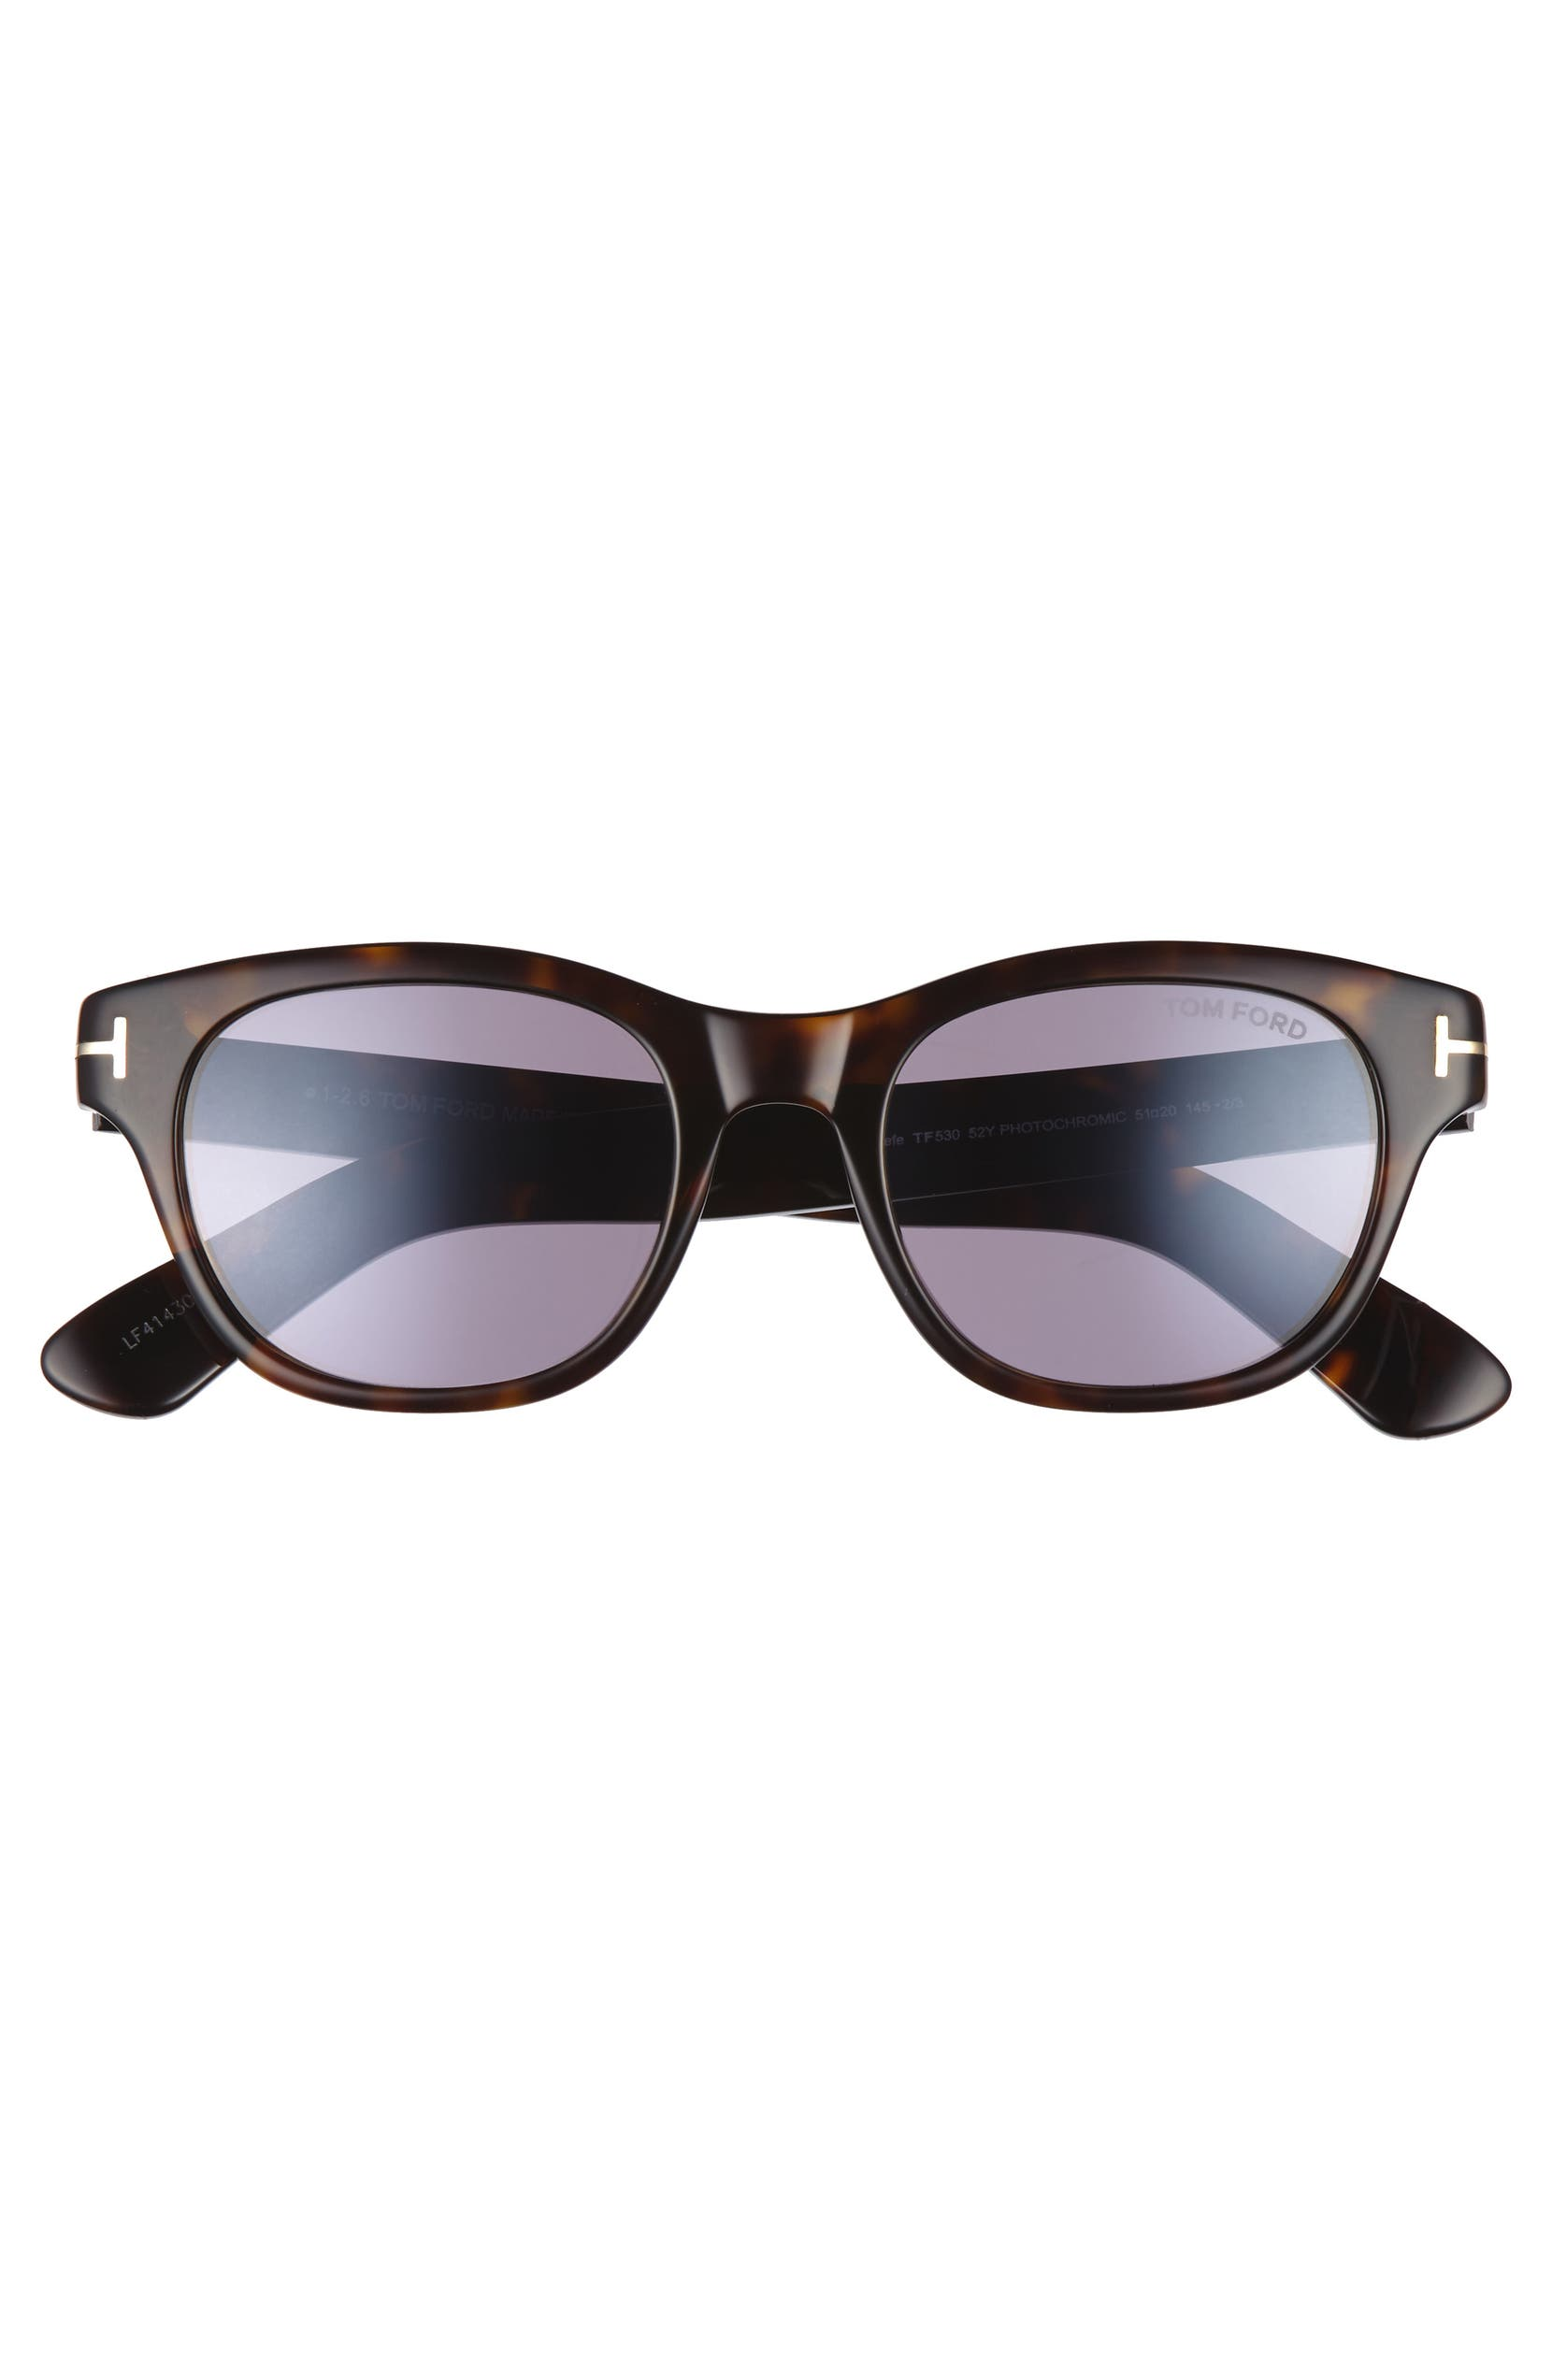 4c655187320a2 Tom Ford O Keefe 51mm Sunglasses